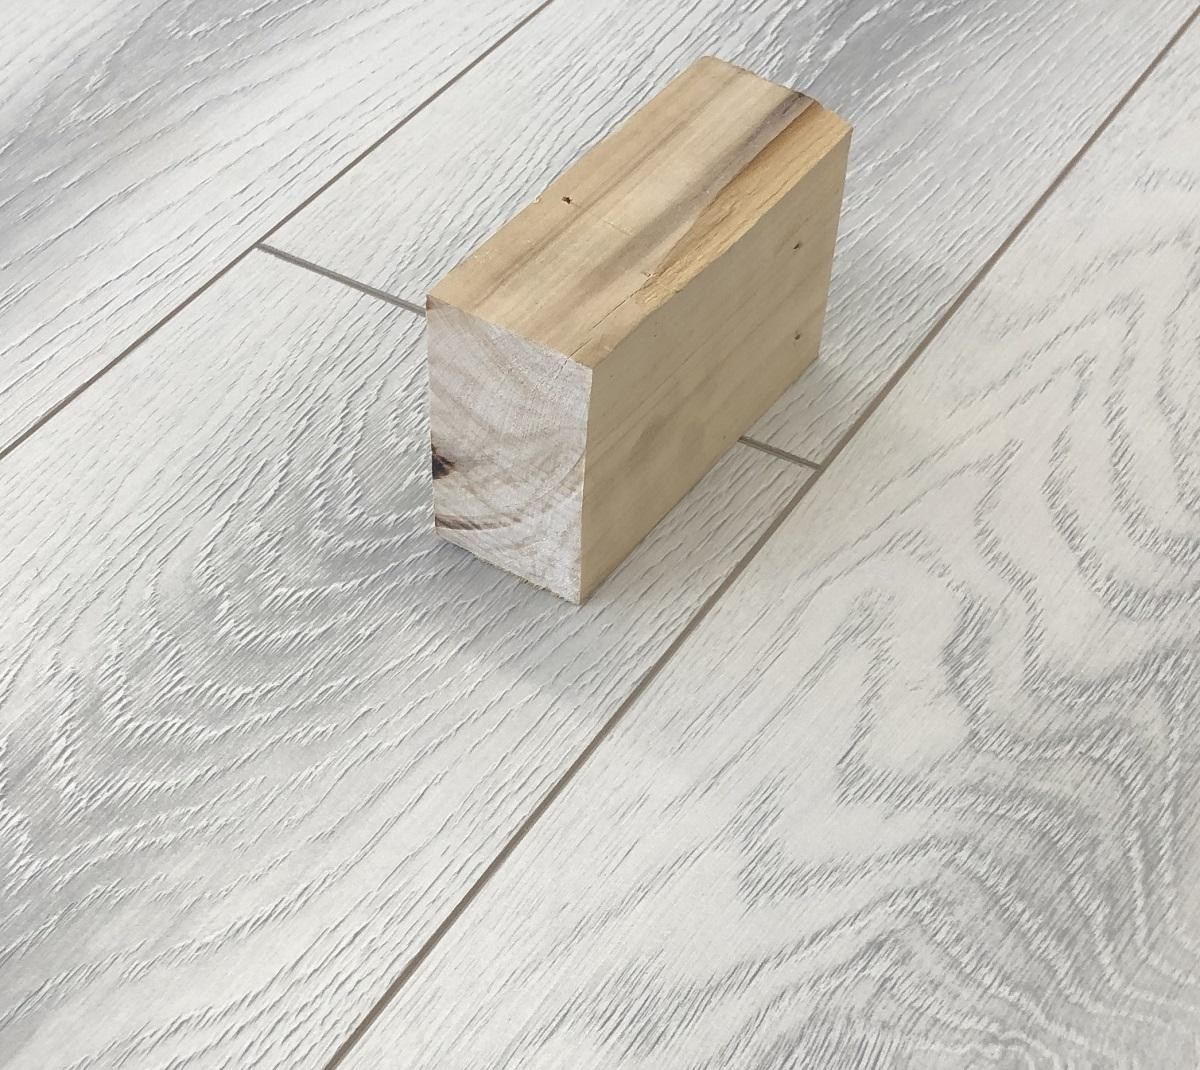 Ламинат Kastamonu Sun-Floor  Вяз Бейкер 1380*195*8 мм  (1уп-2,153 м2/8 шт )  32кл  фаска V4